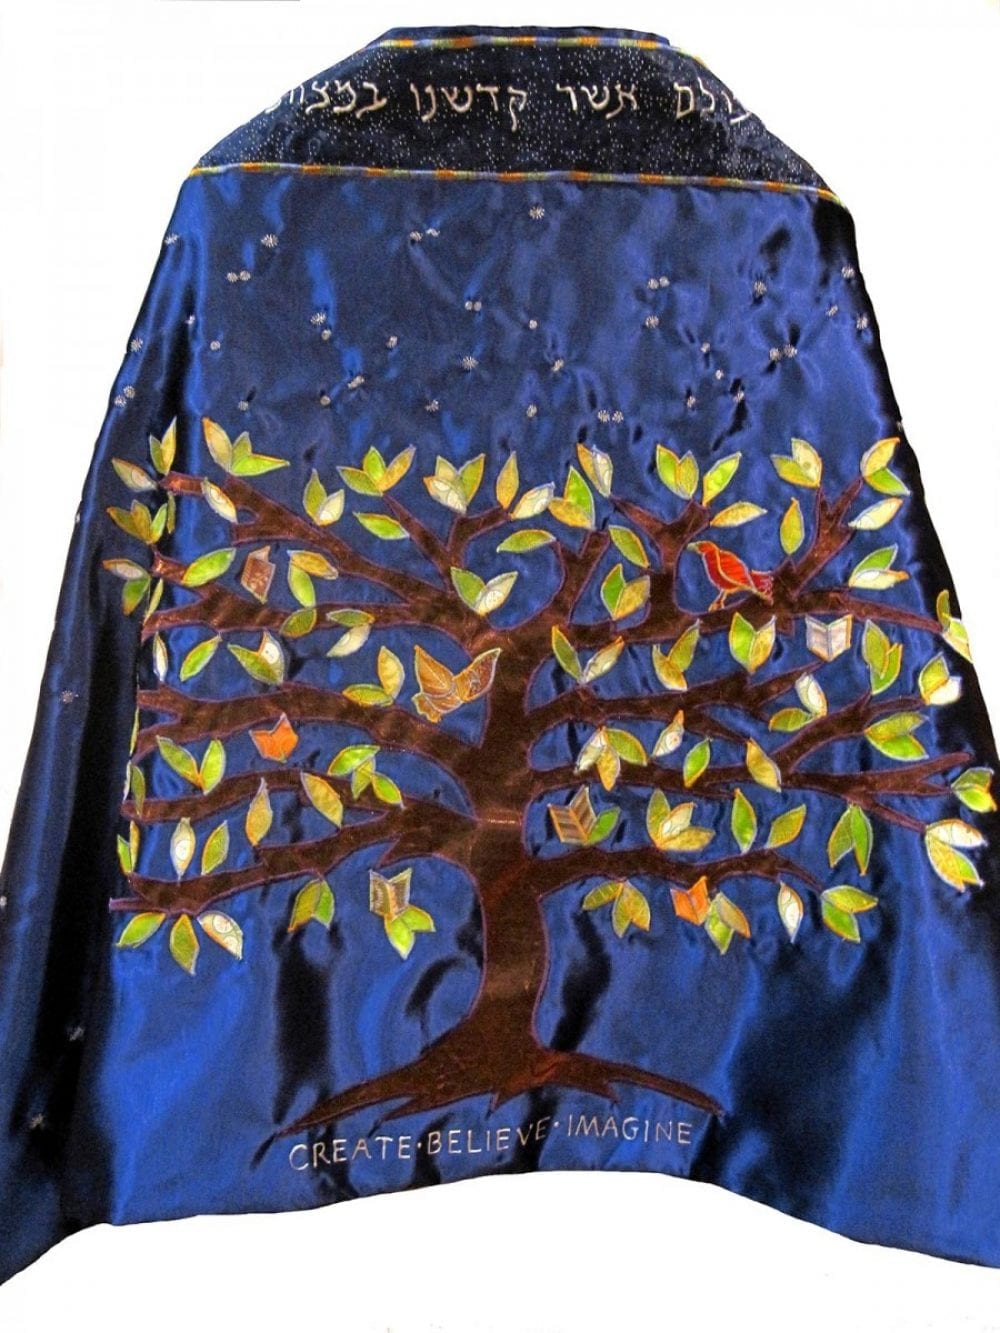 Custom blue talli with Tree of Life appliqué